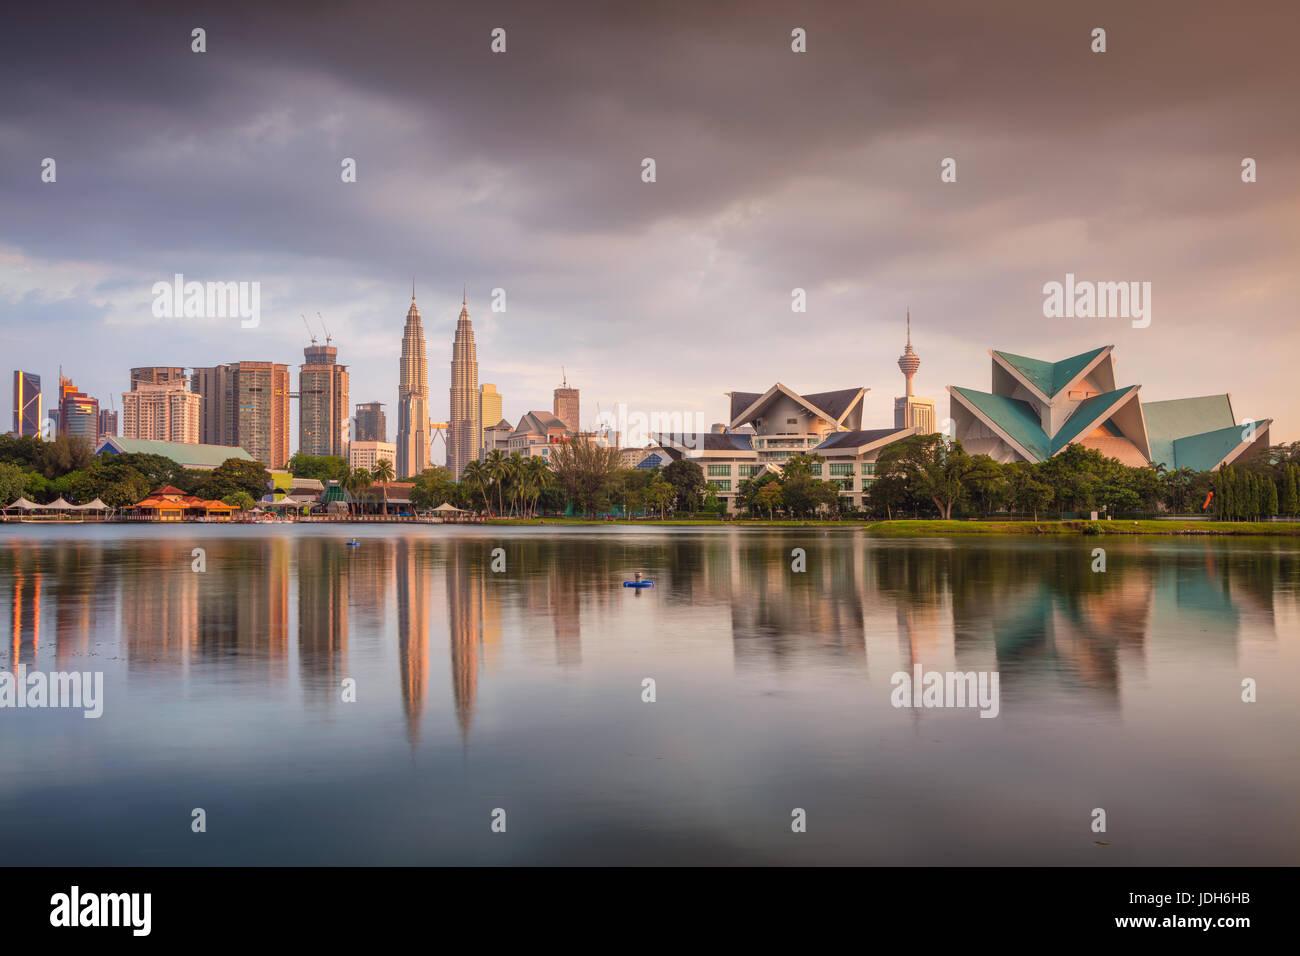 Kuala Lumpur. Cityscape image of Kuala Lumpur skyline during sunset. Stock Photo